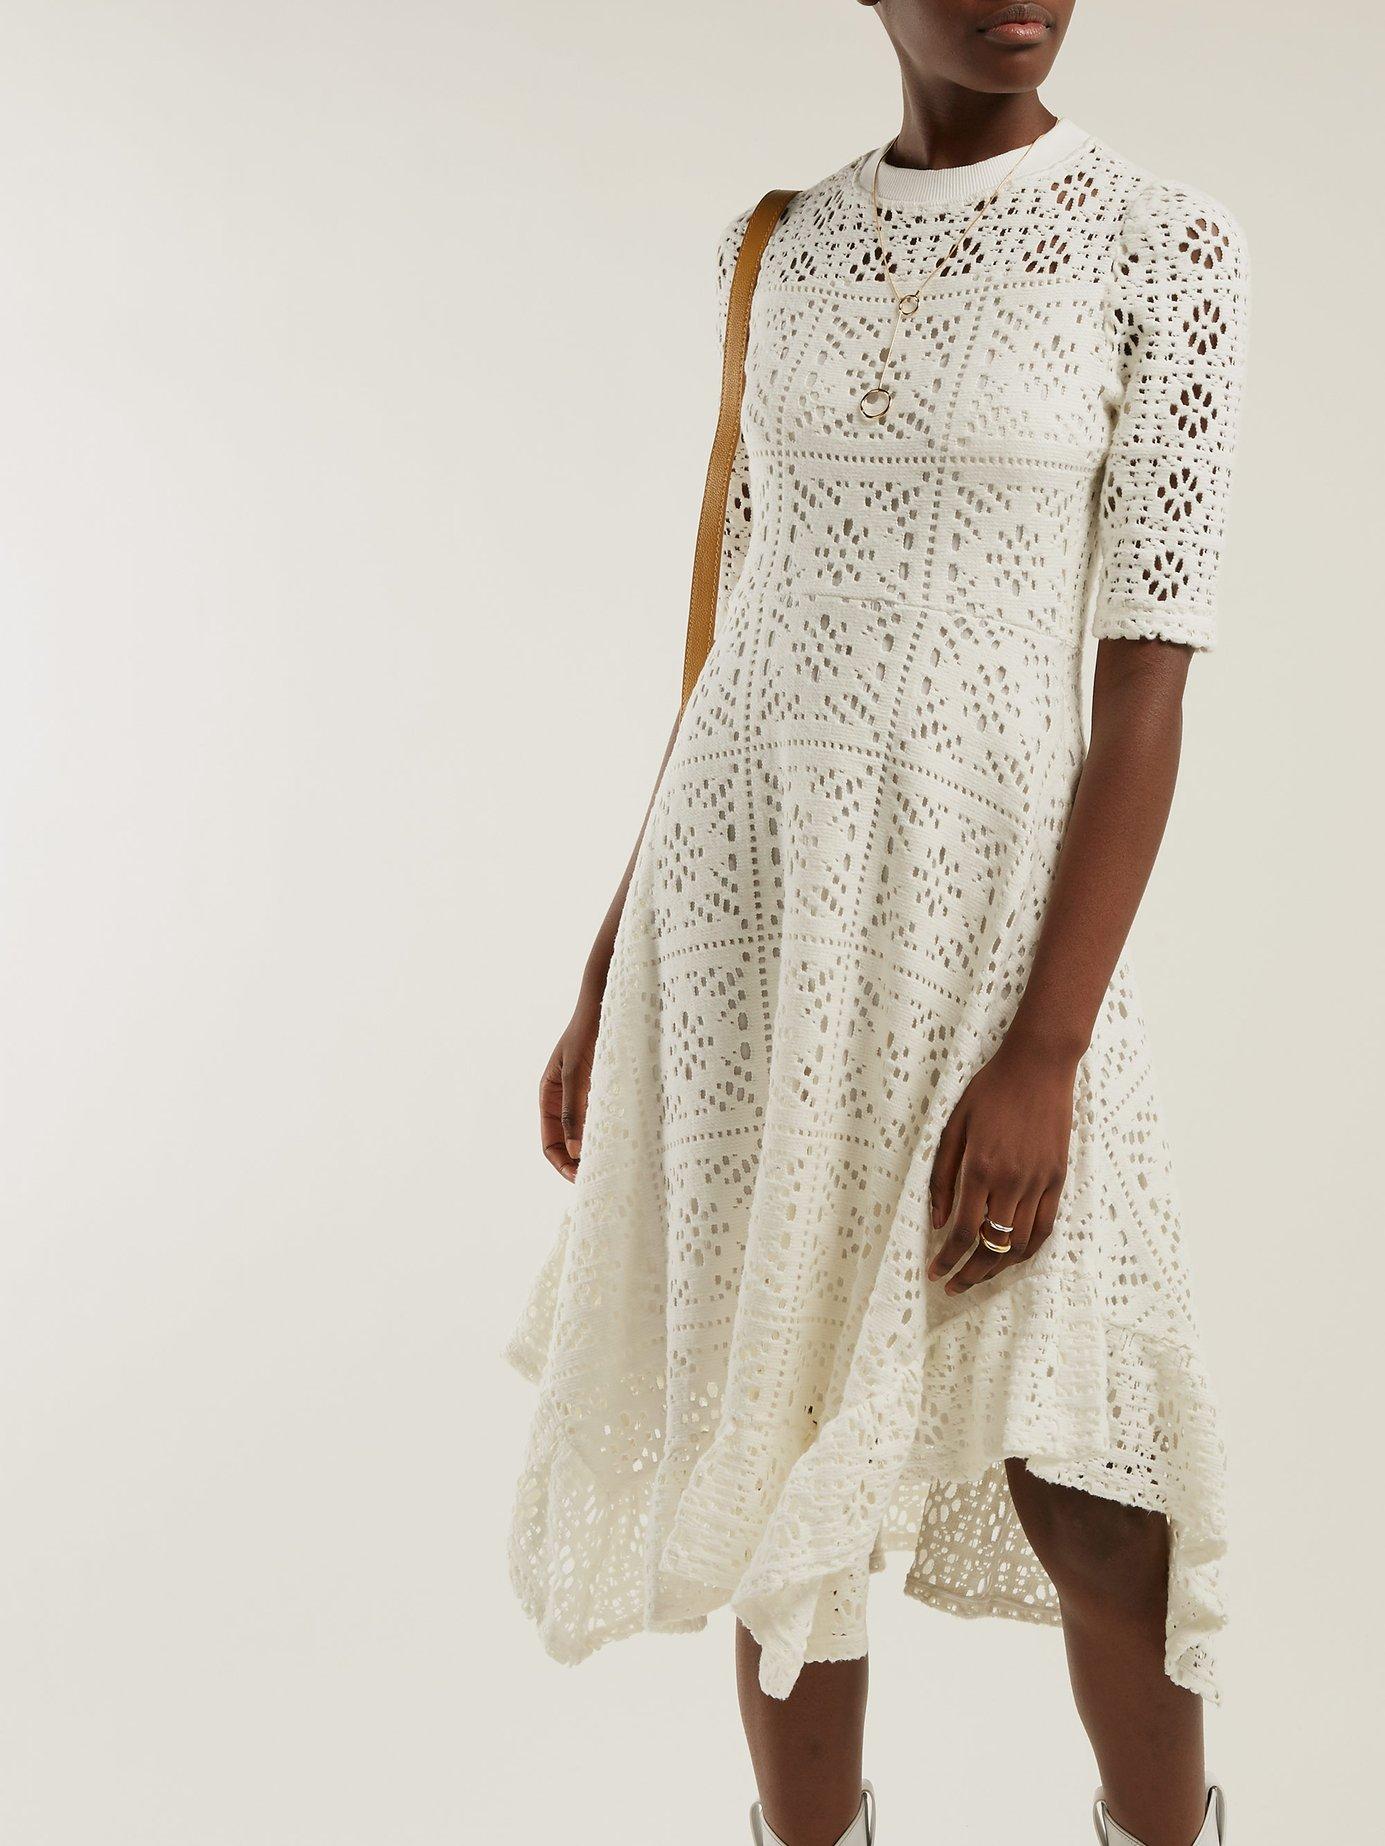 Dipped-hem lace dress by